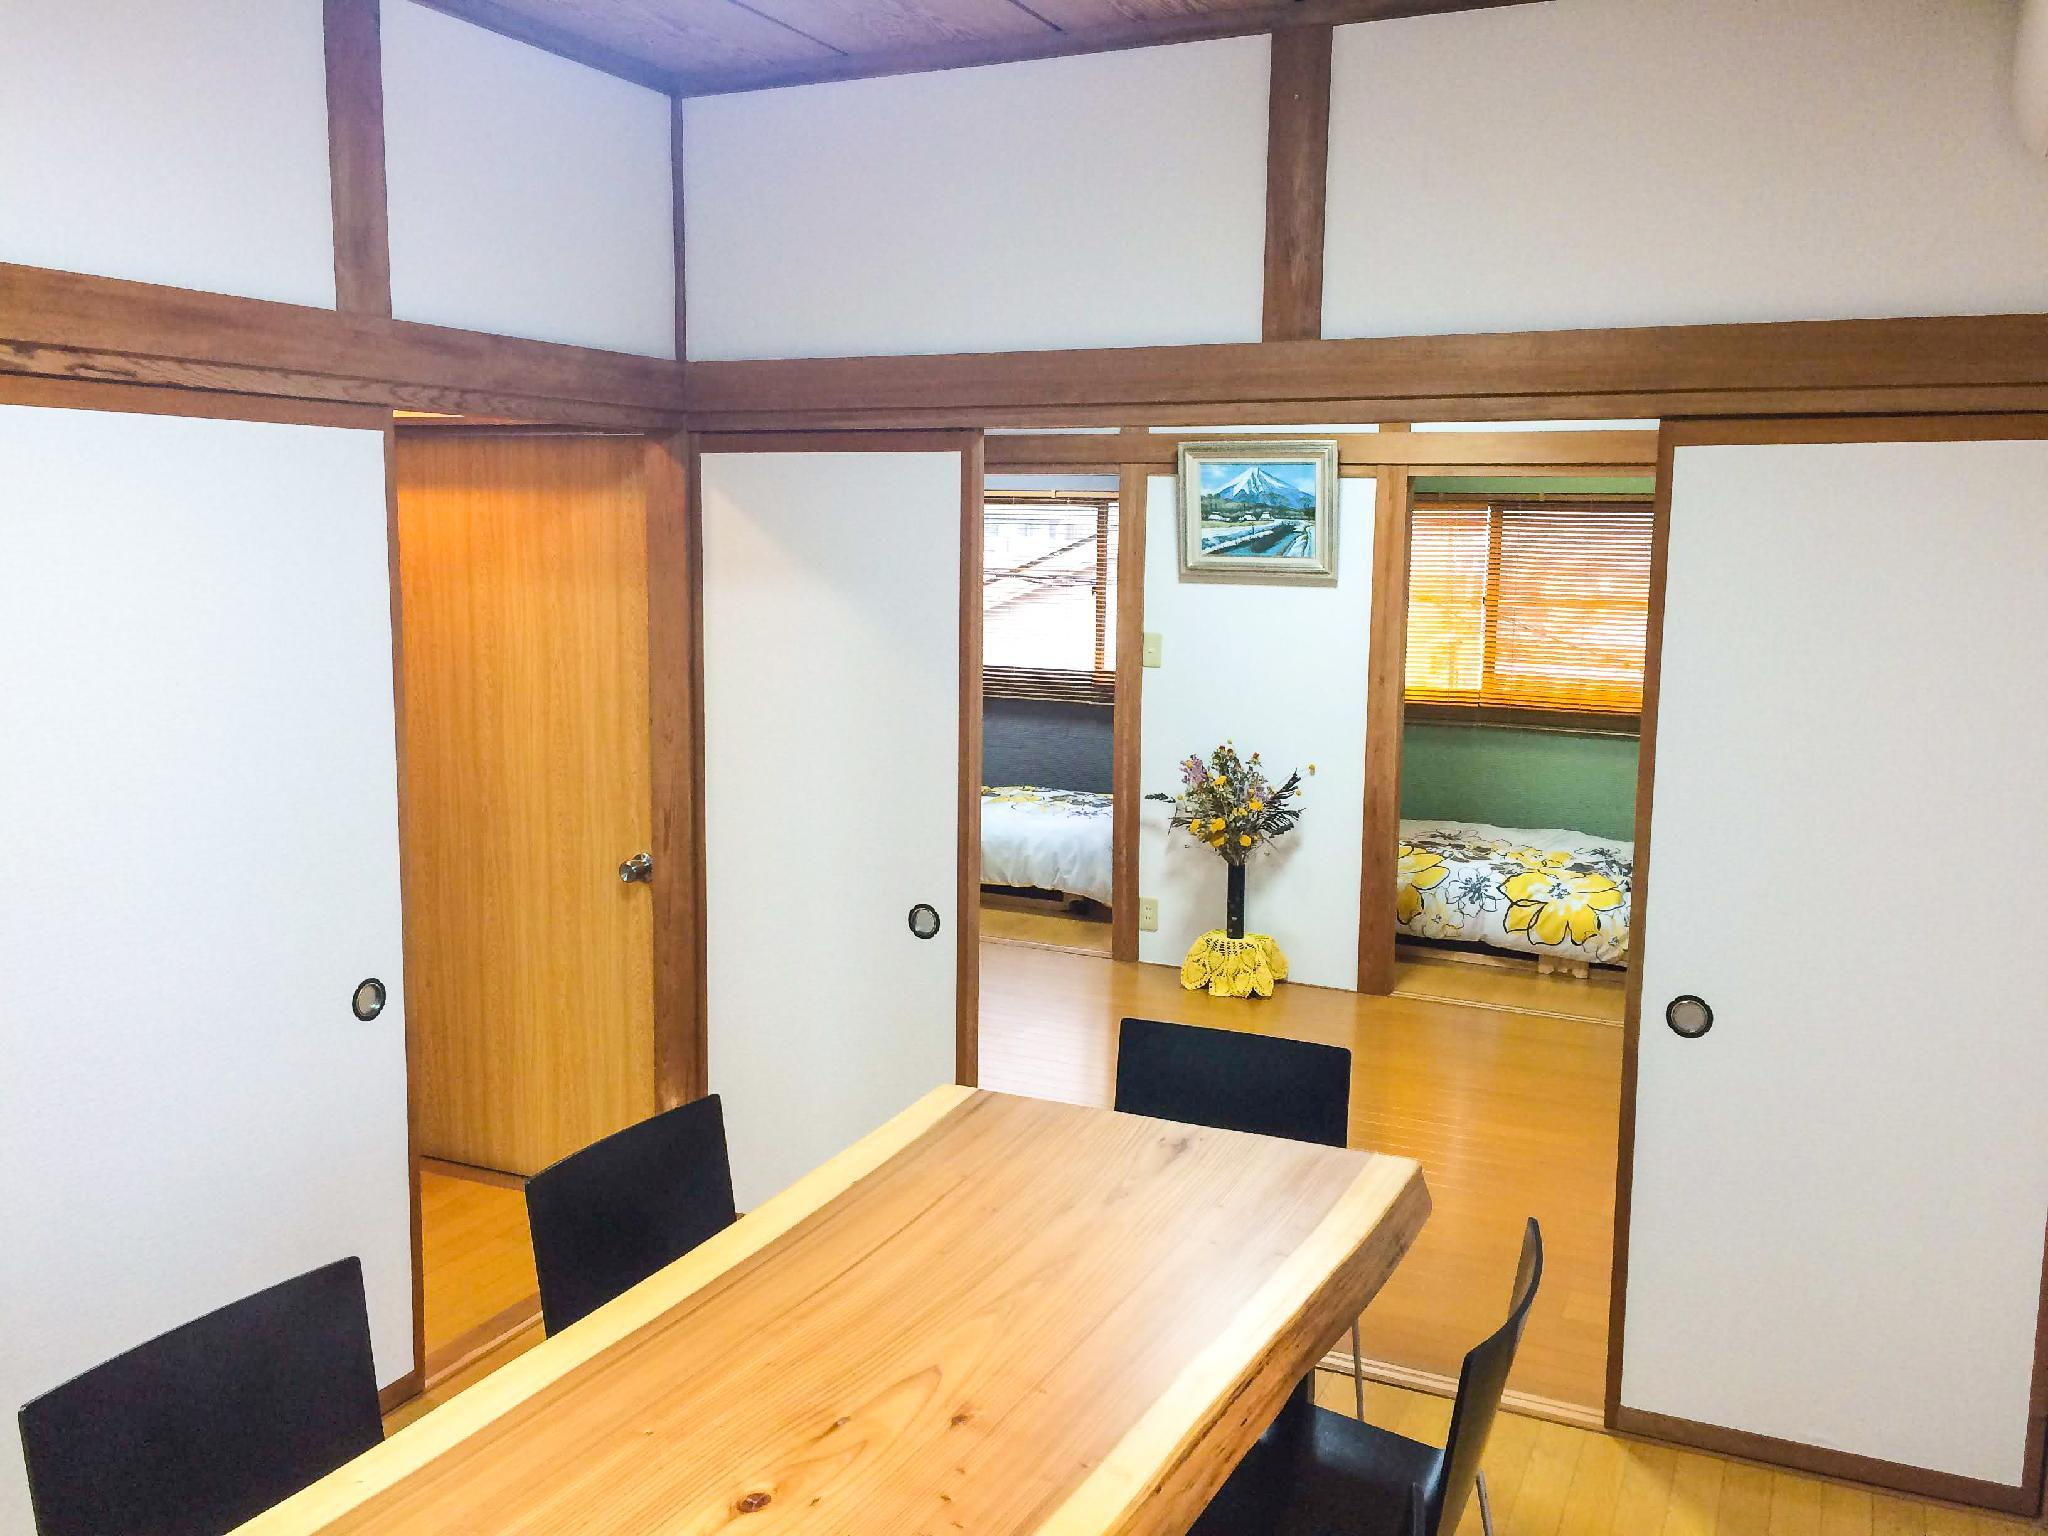 LARGE 6 Bedroom 200 SQ M HOUSE 30 MIN TO SHINJUKU